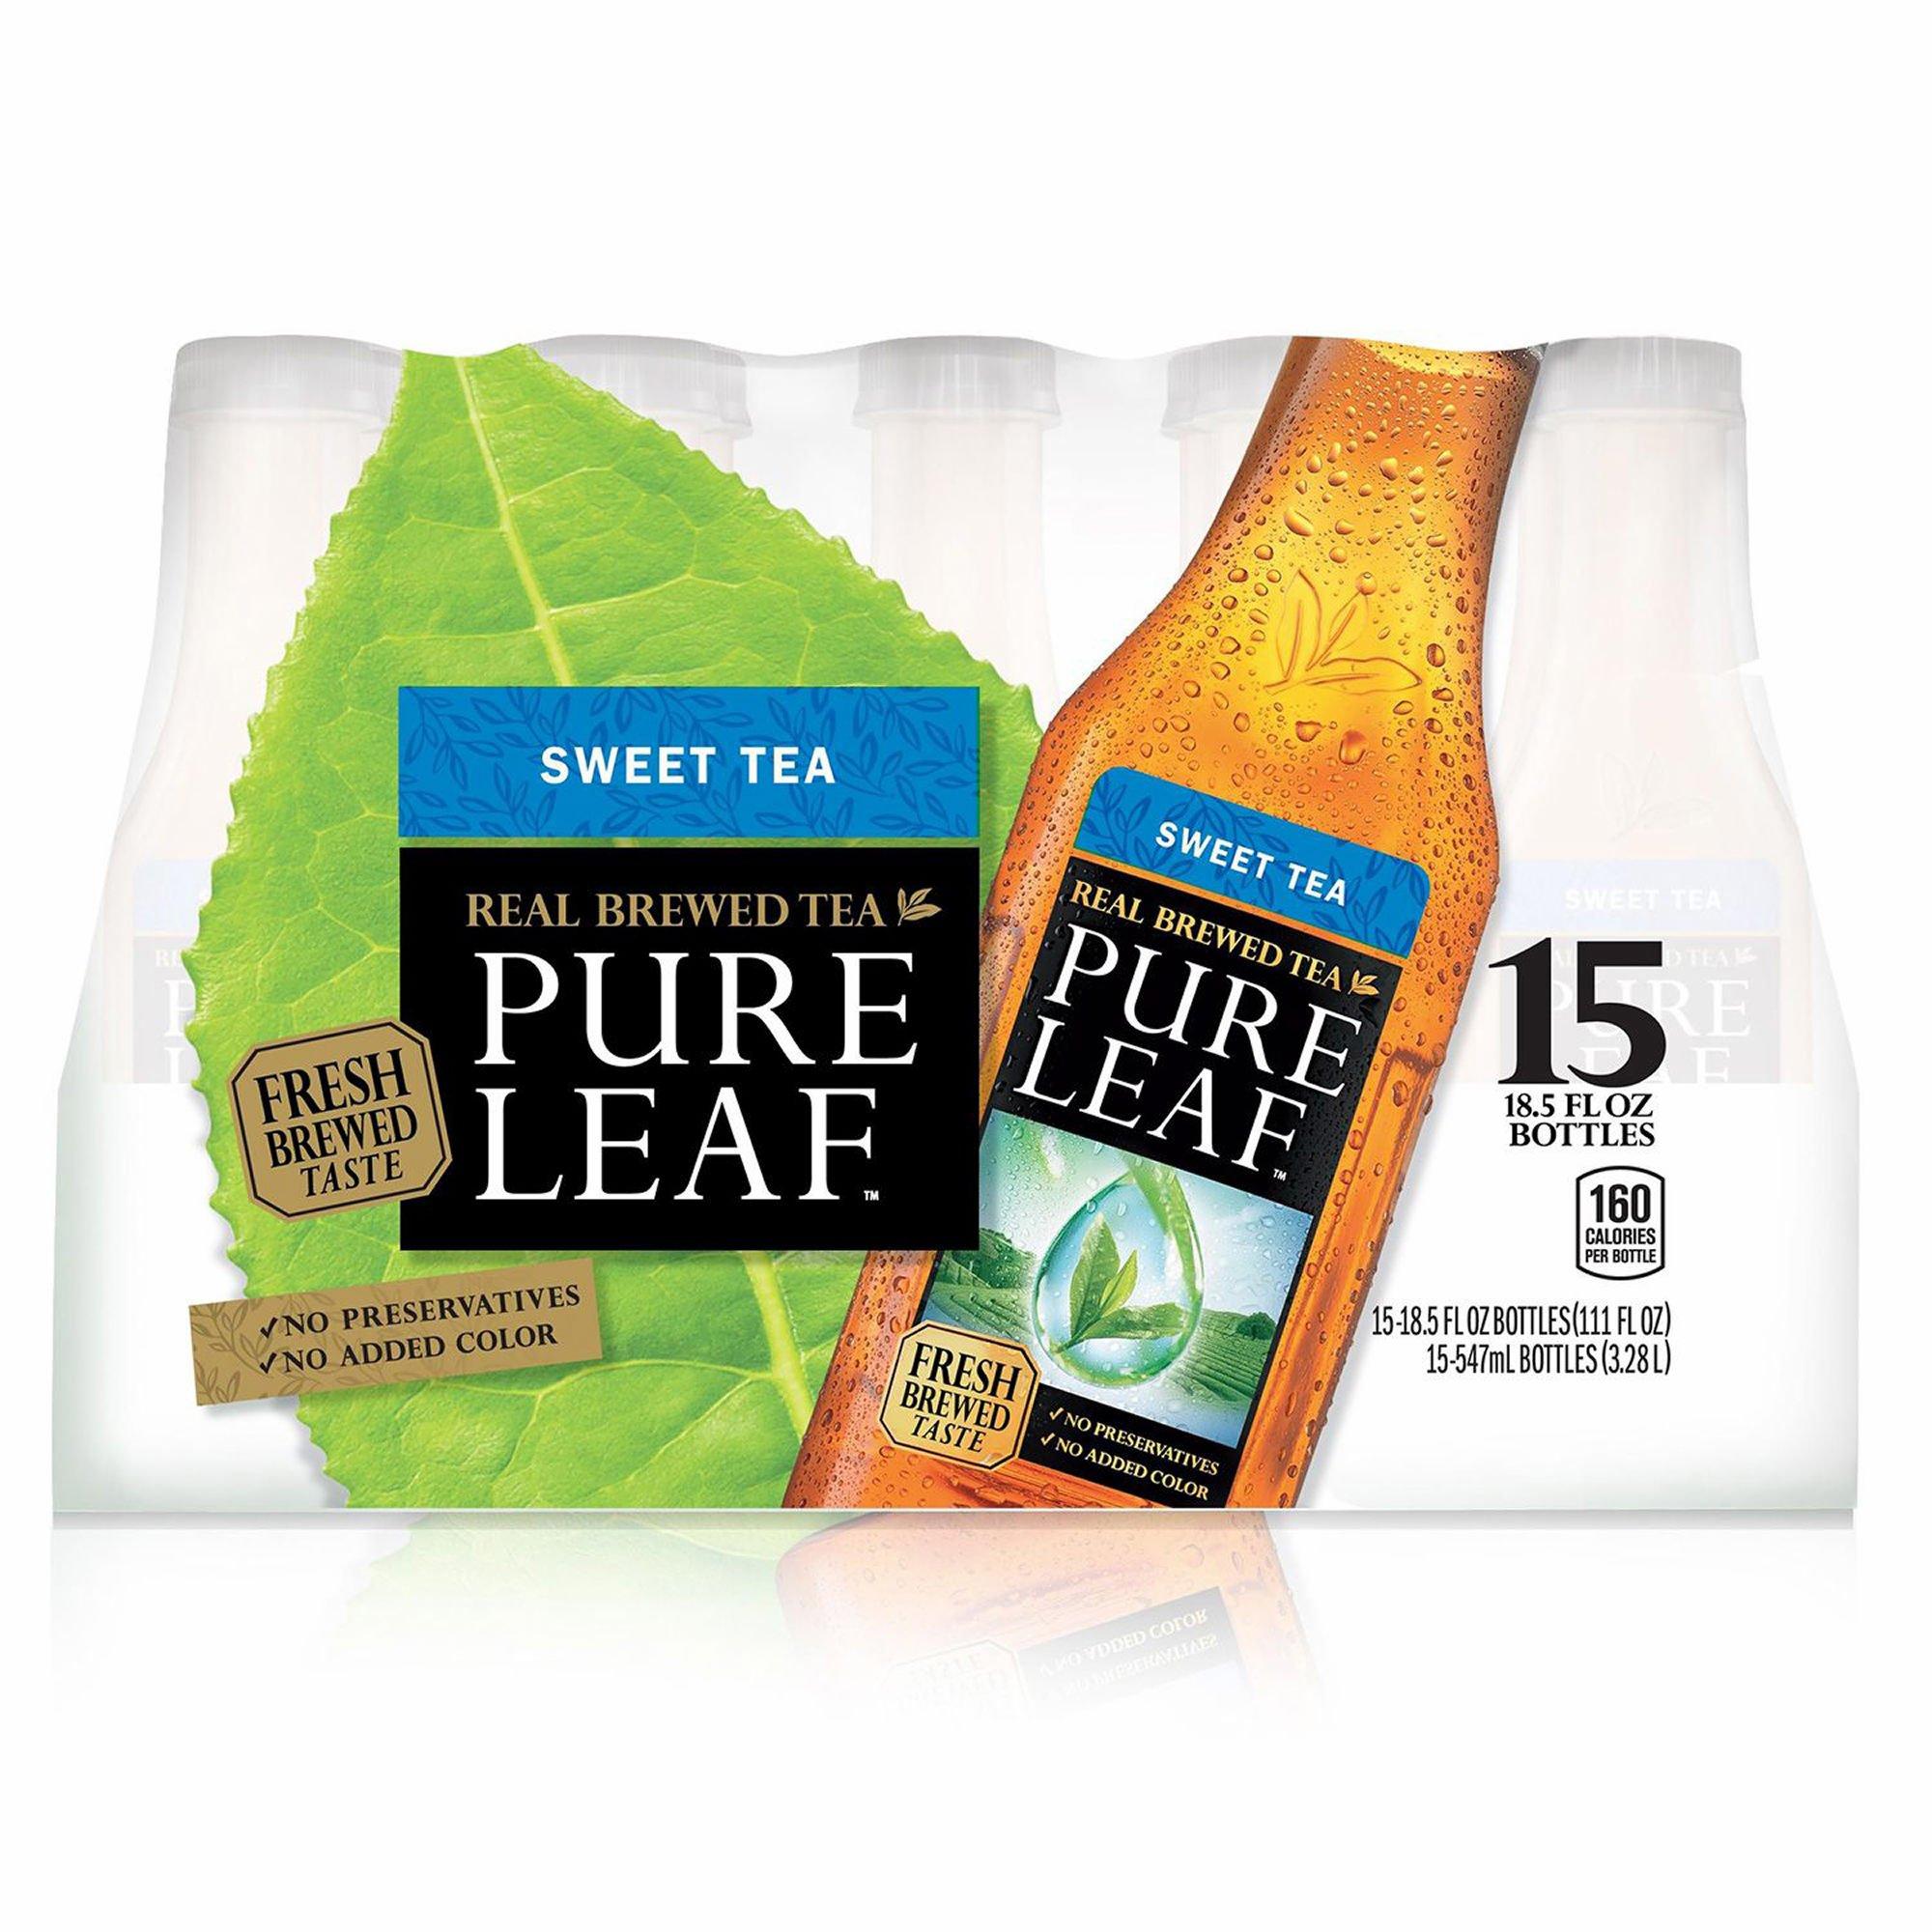 Pure Leaf Real Brewed Sweet Tea, 15 pk./18.5 oz. (pack of 6) by Pure Leaf (Image #1)